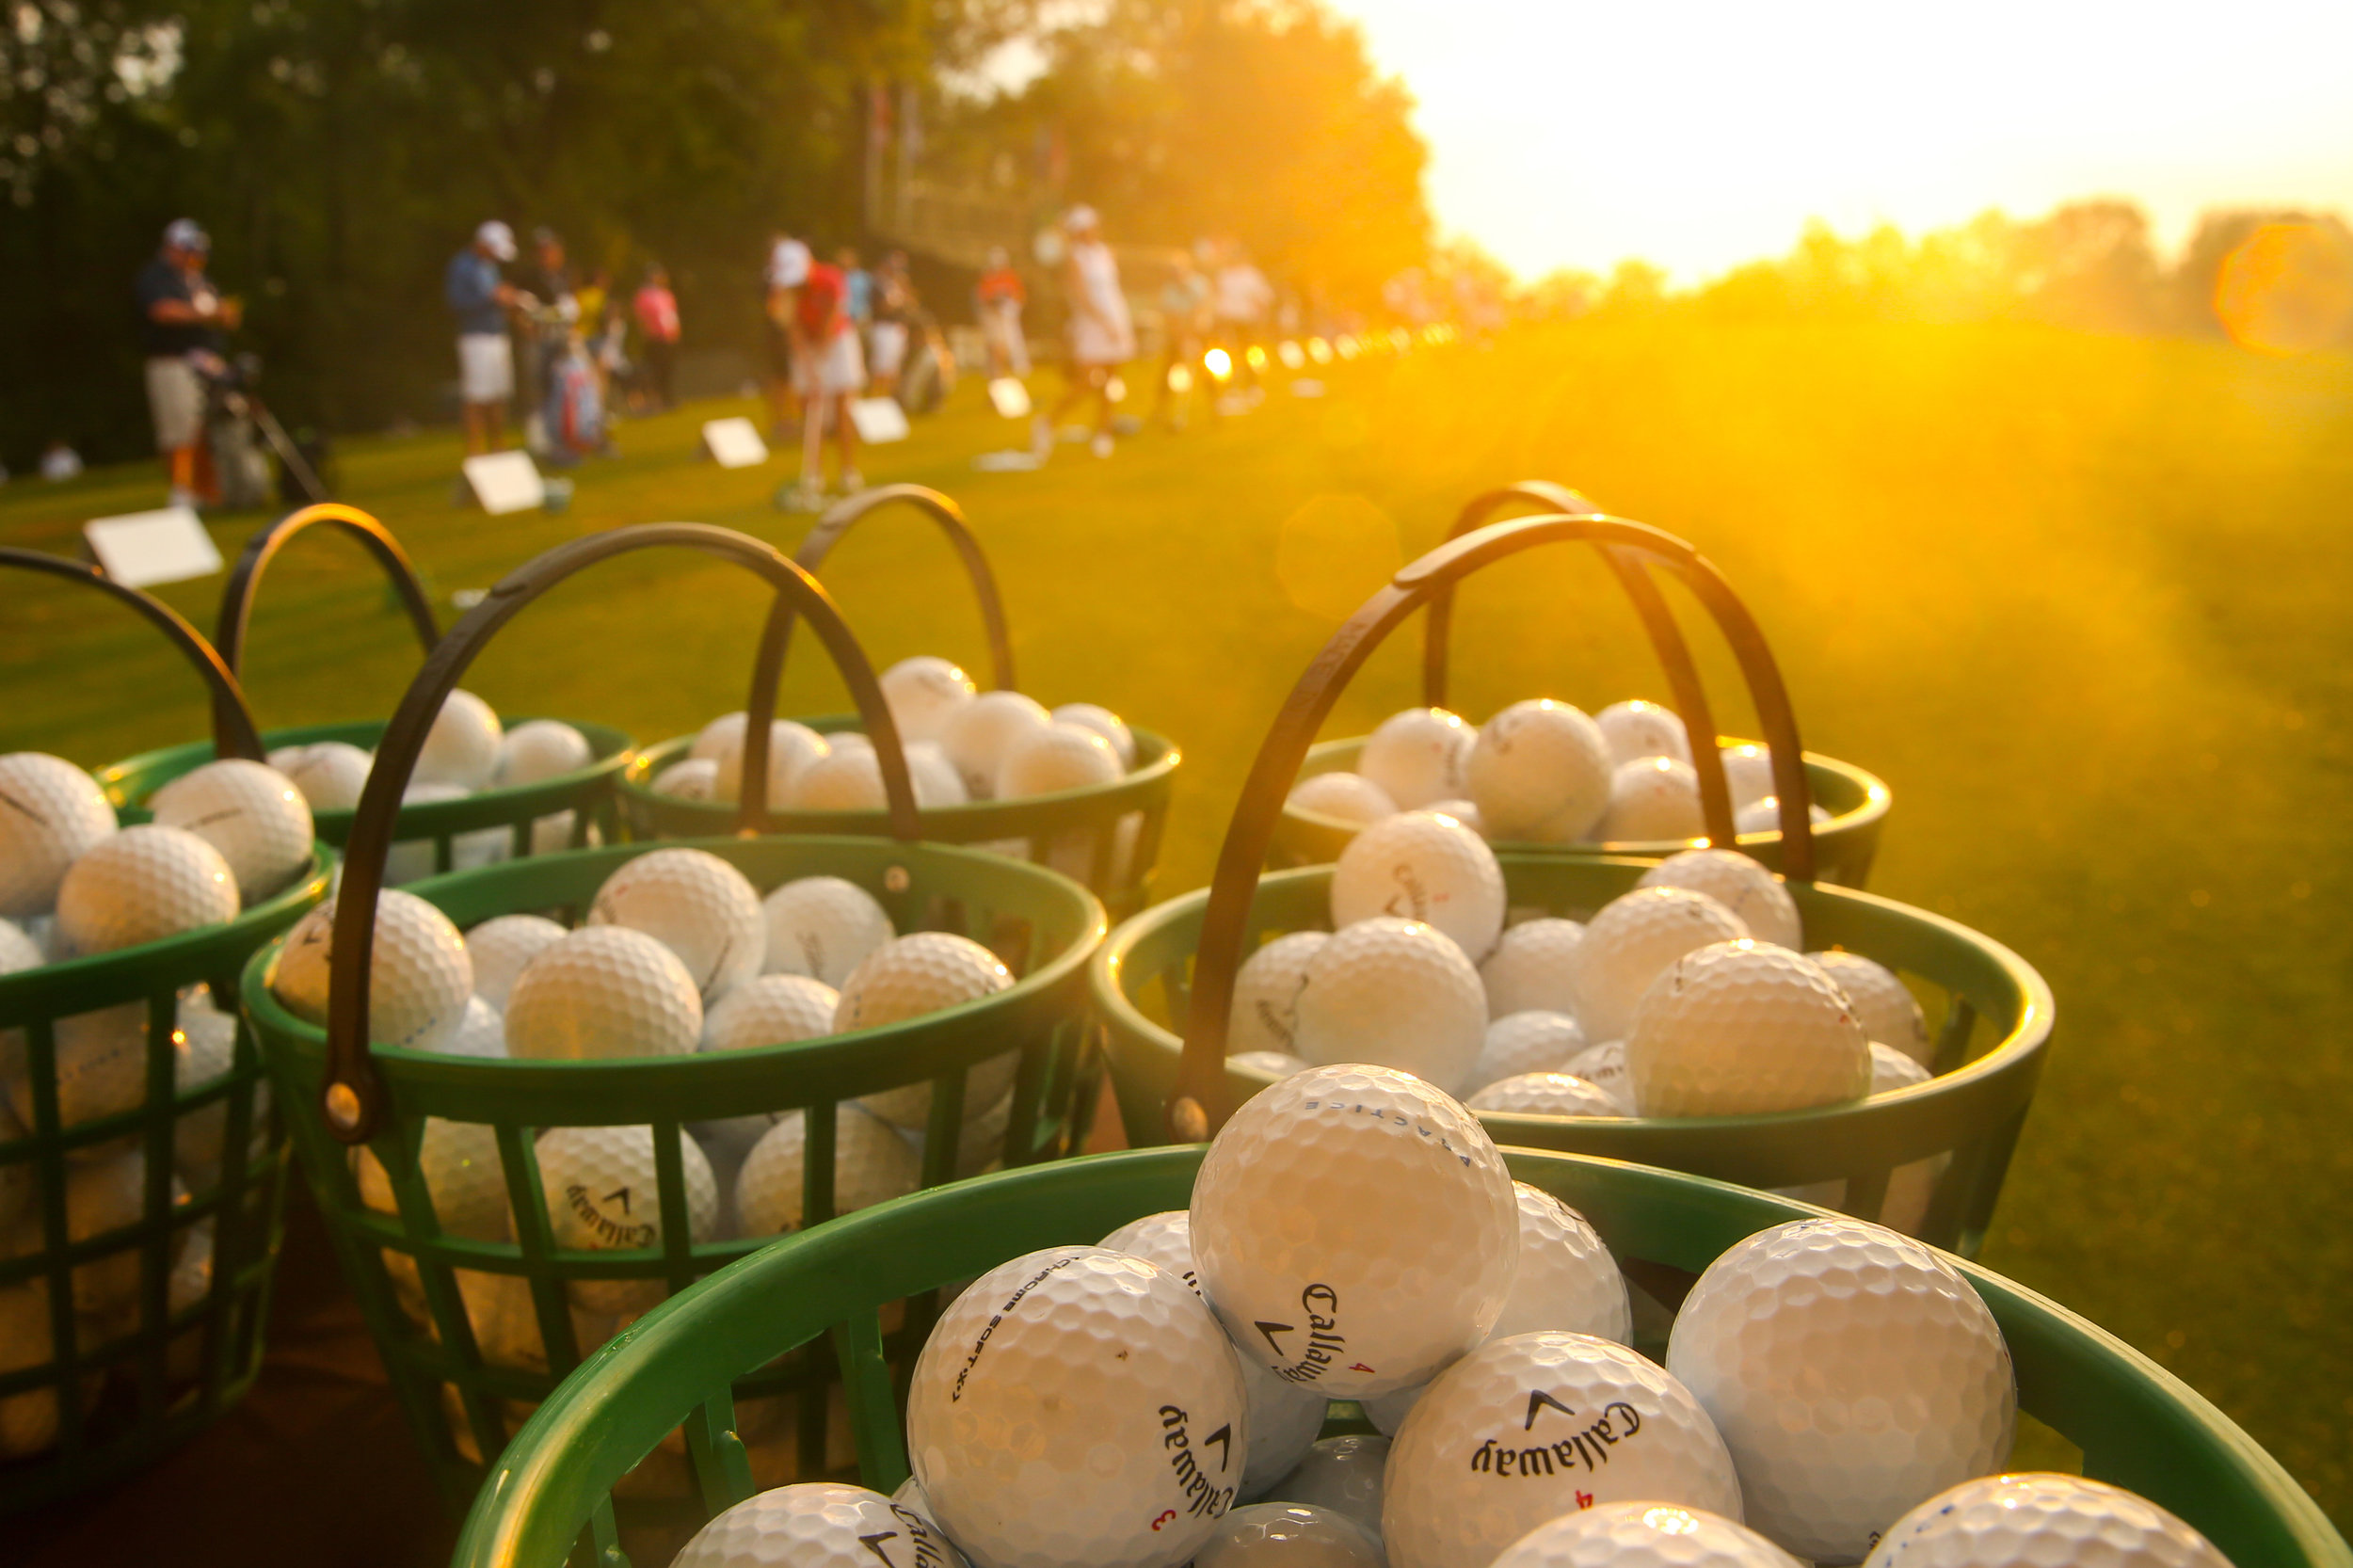 Driving range, 2017 U.S. Women's Open Championship. .  Trump Bedminster Golf Club, Bedminster, New Jersey. Canon 1DX, Canon EF 24-70mm f2.8L